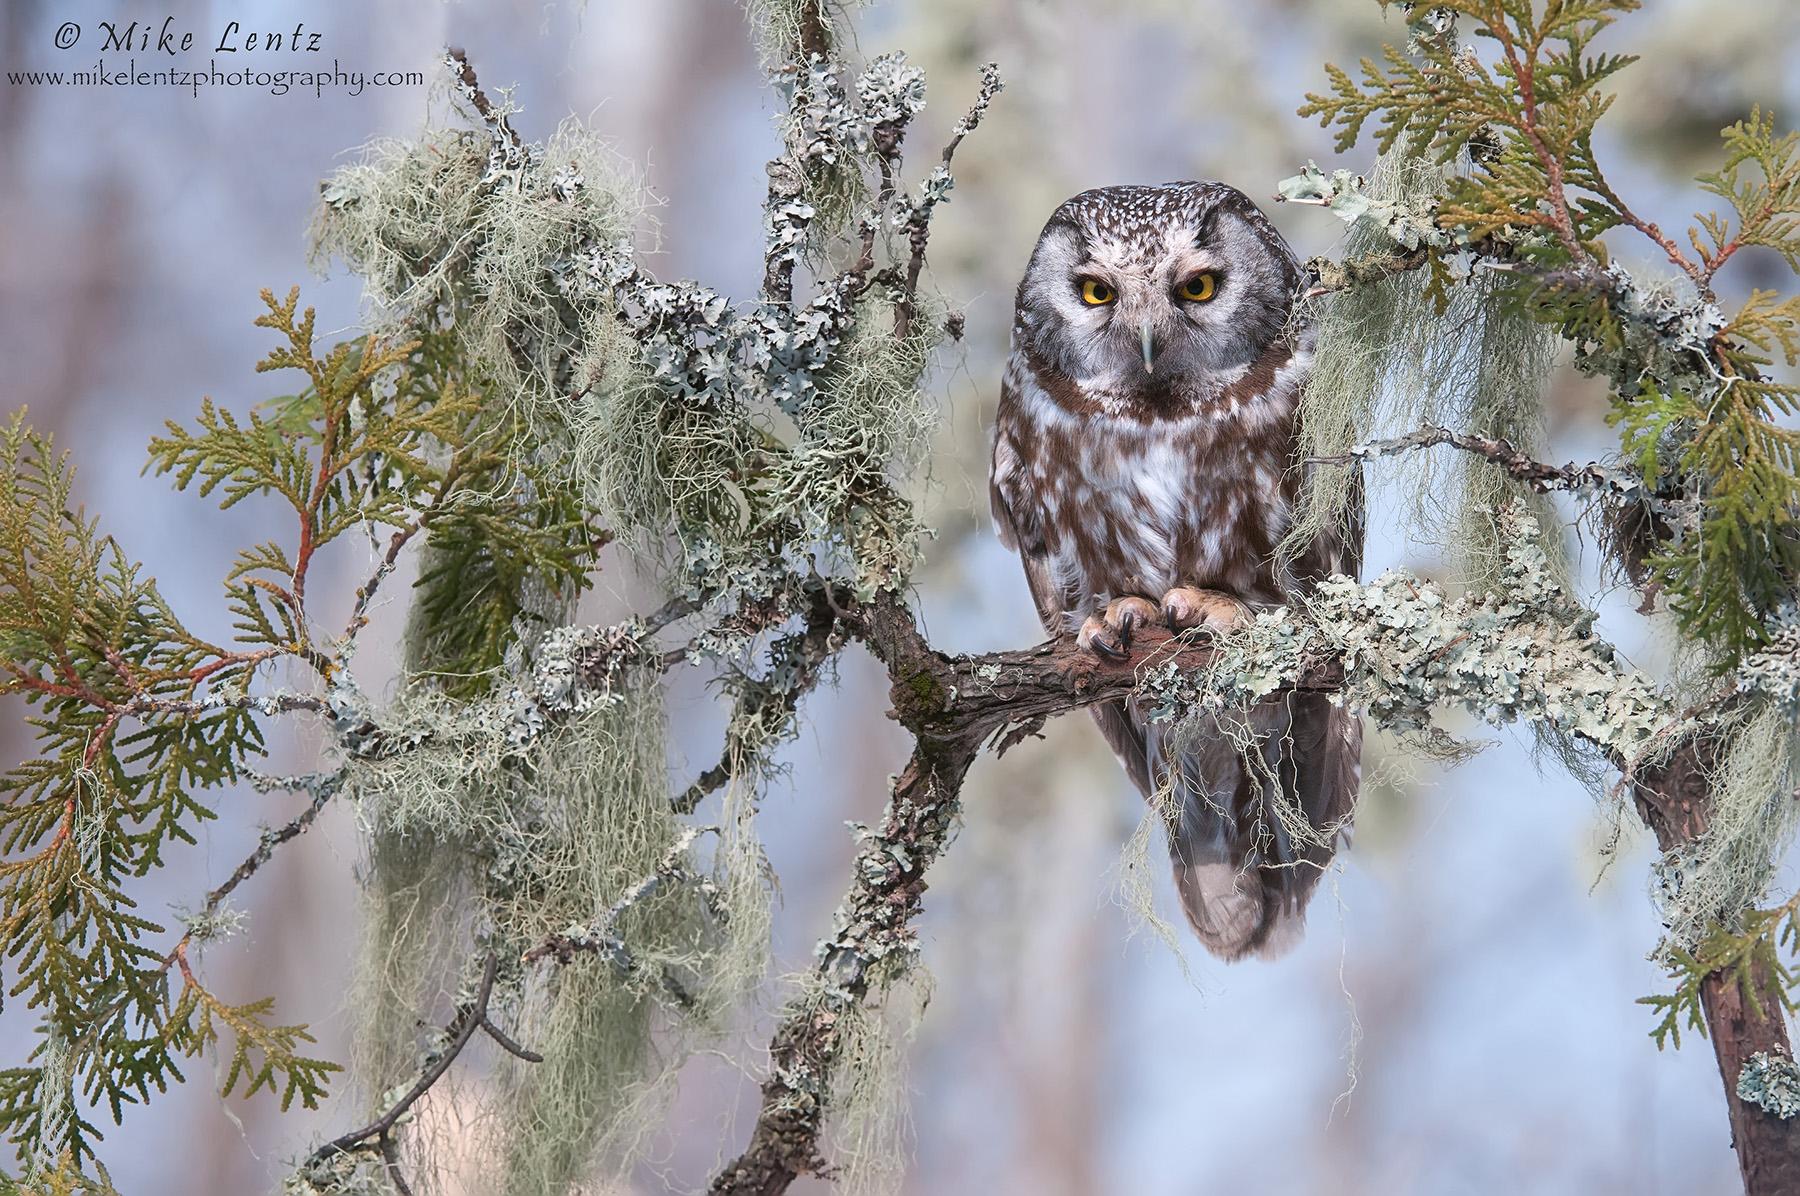 Boreal Owl in boreal habitat